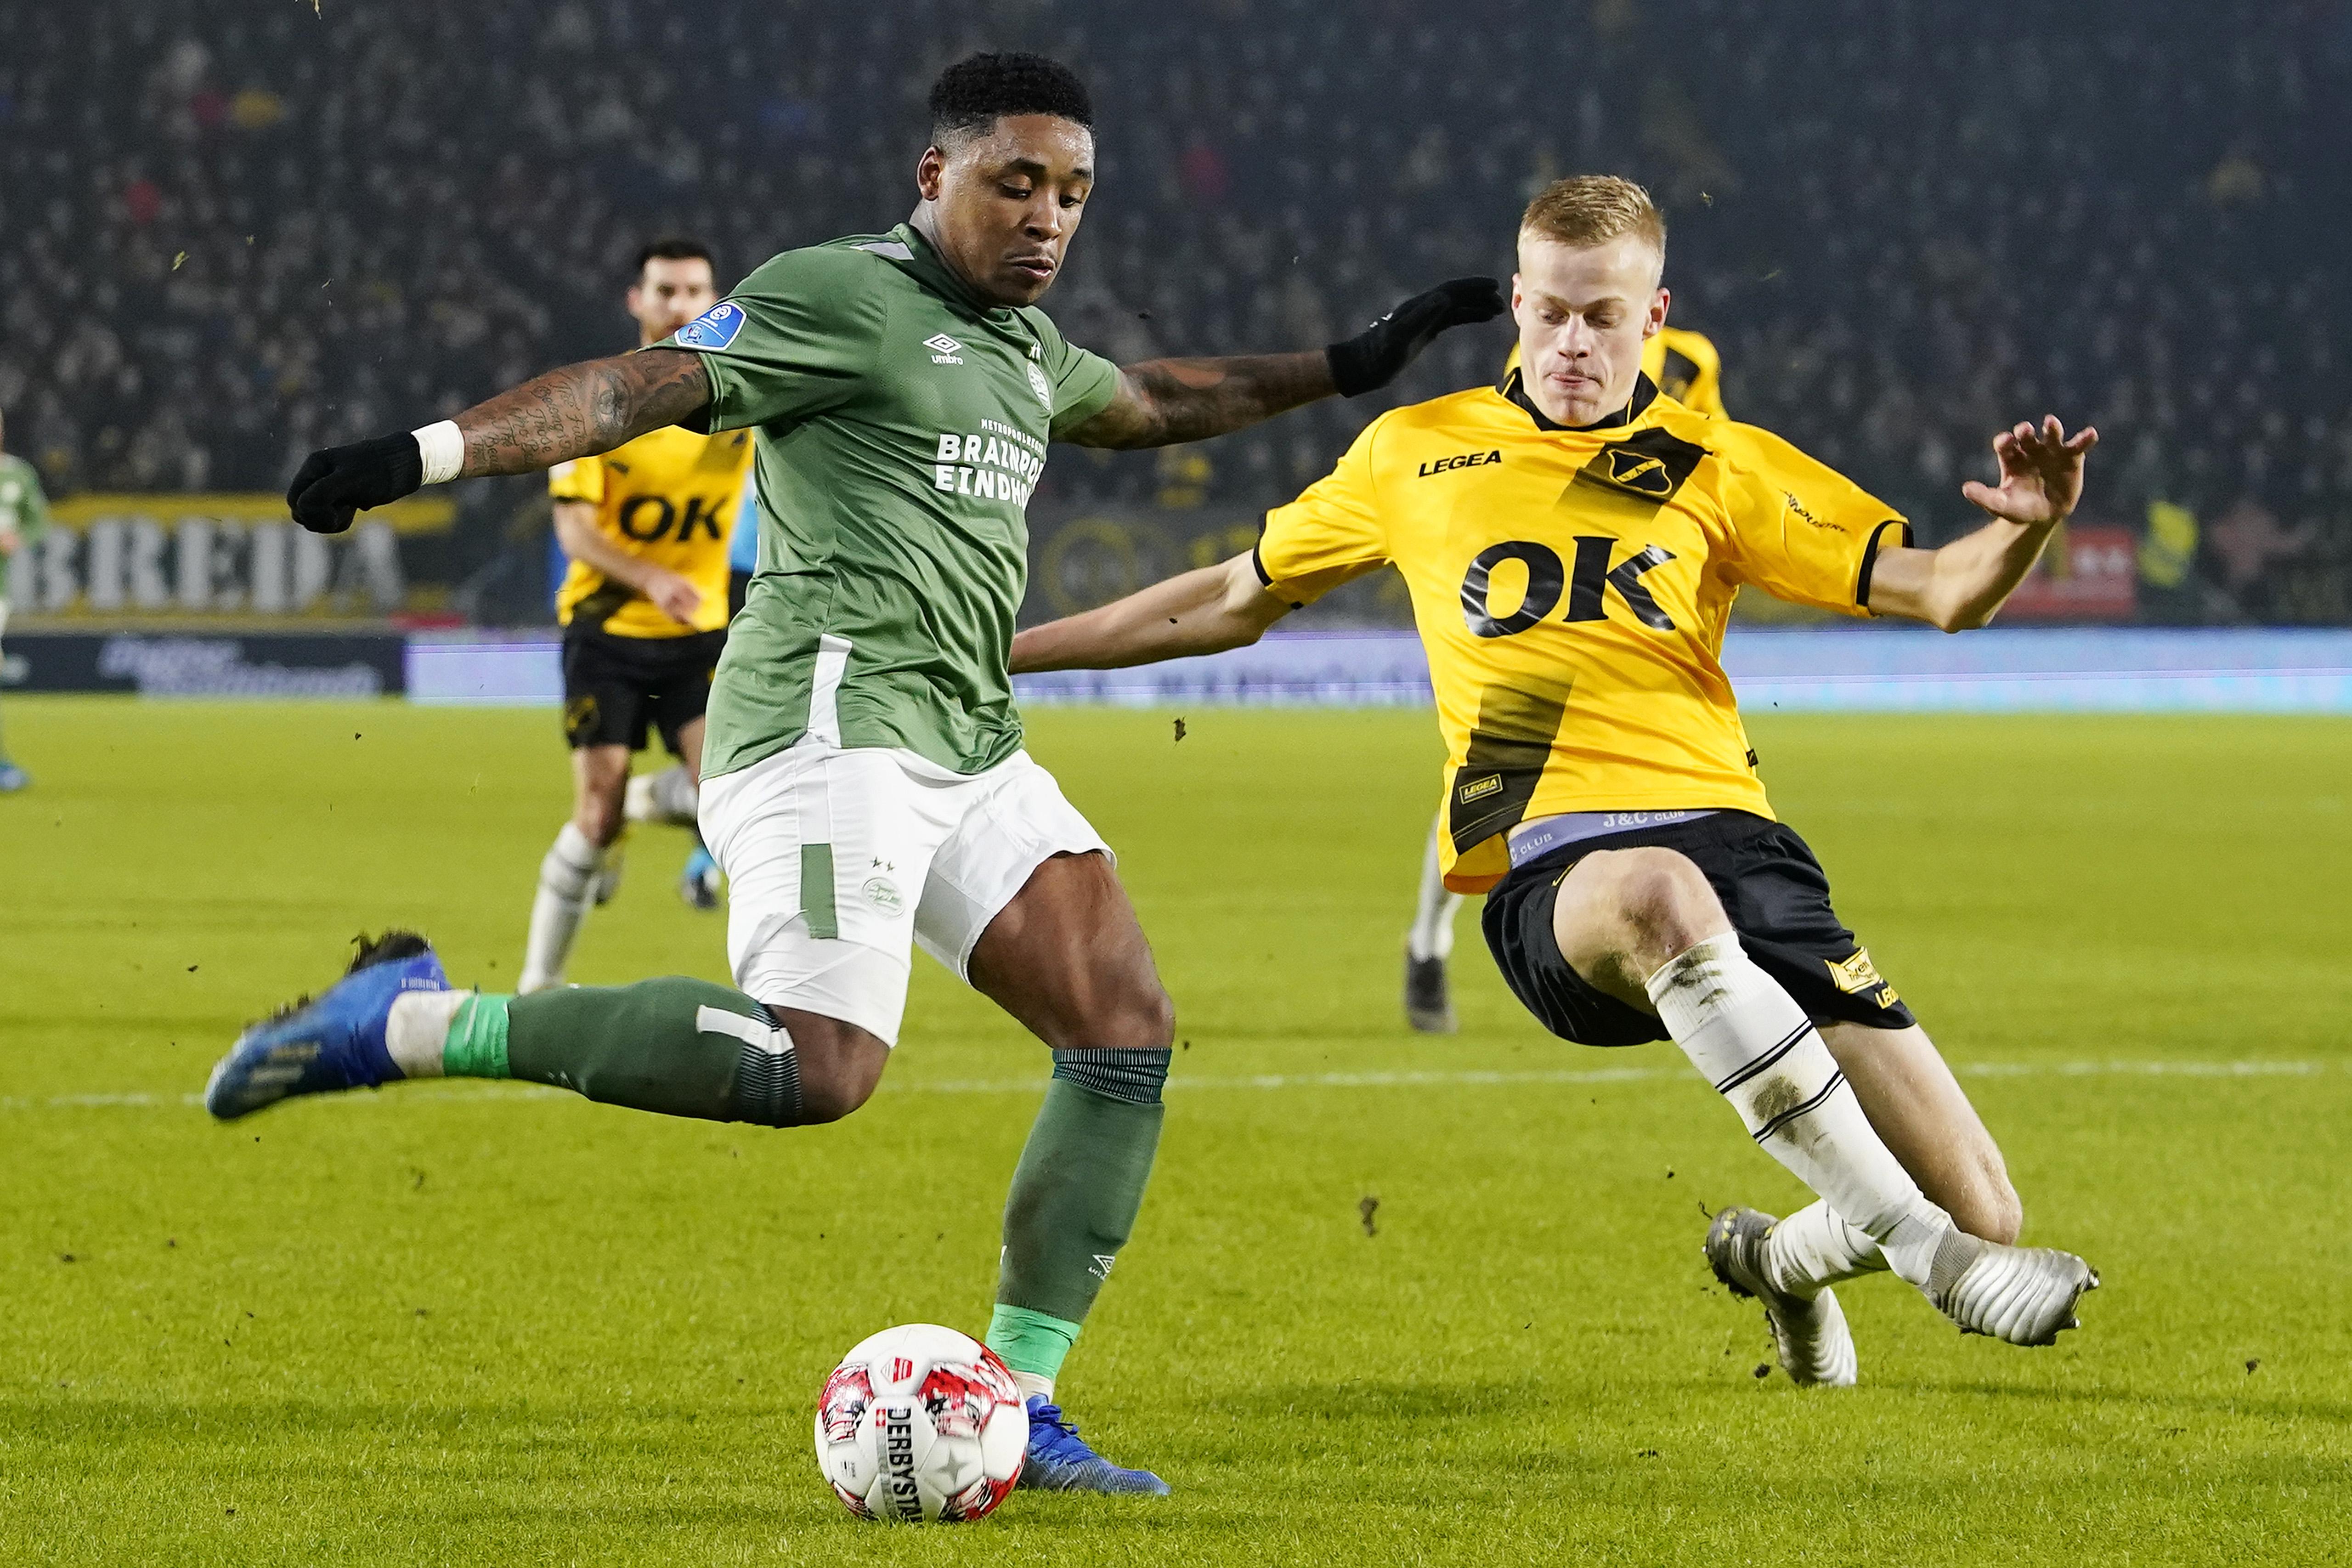 NAC Breda v PSV - Dutch KNVB Beker